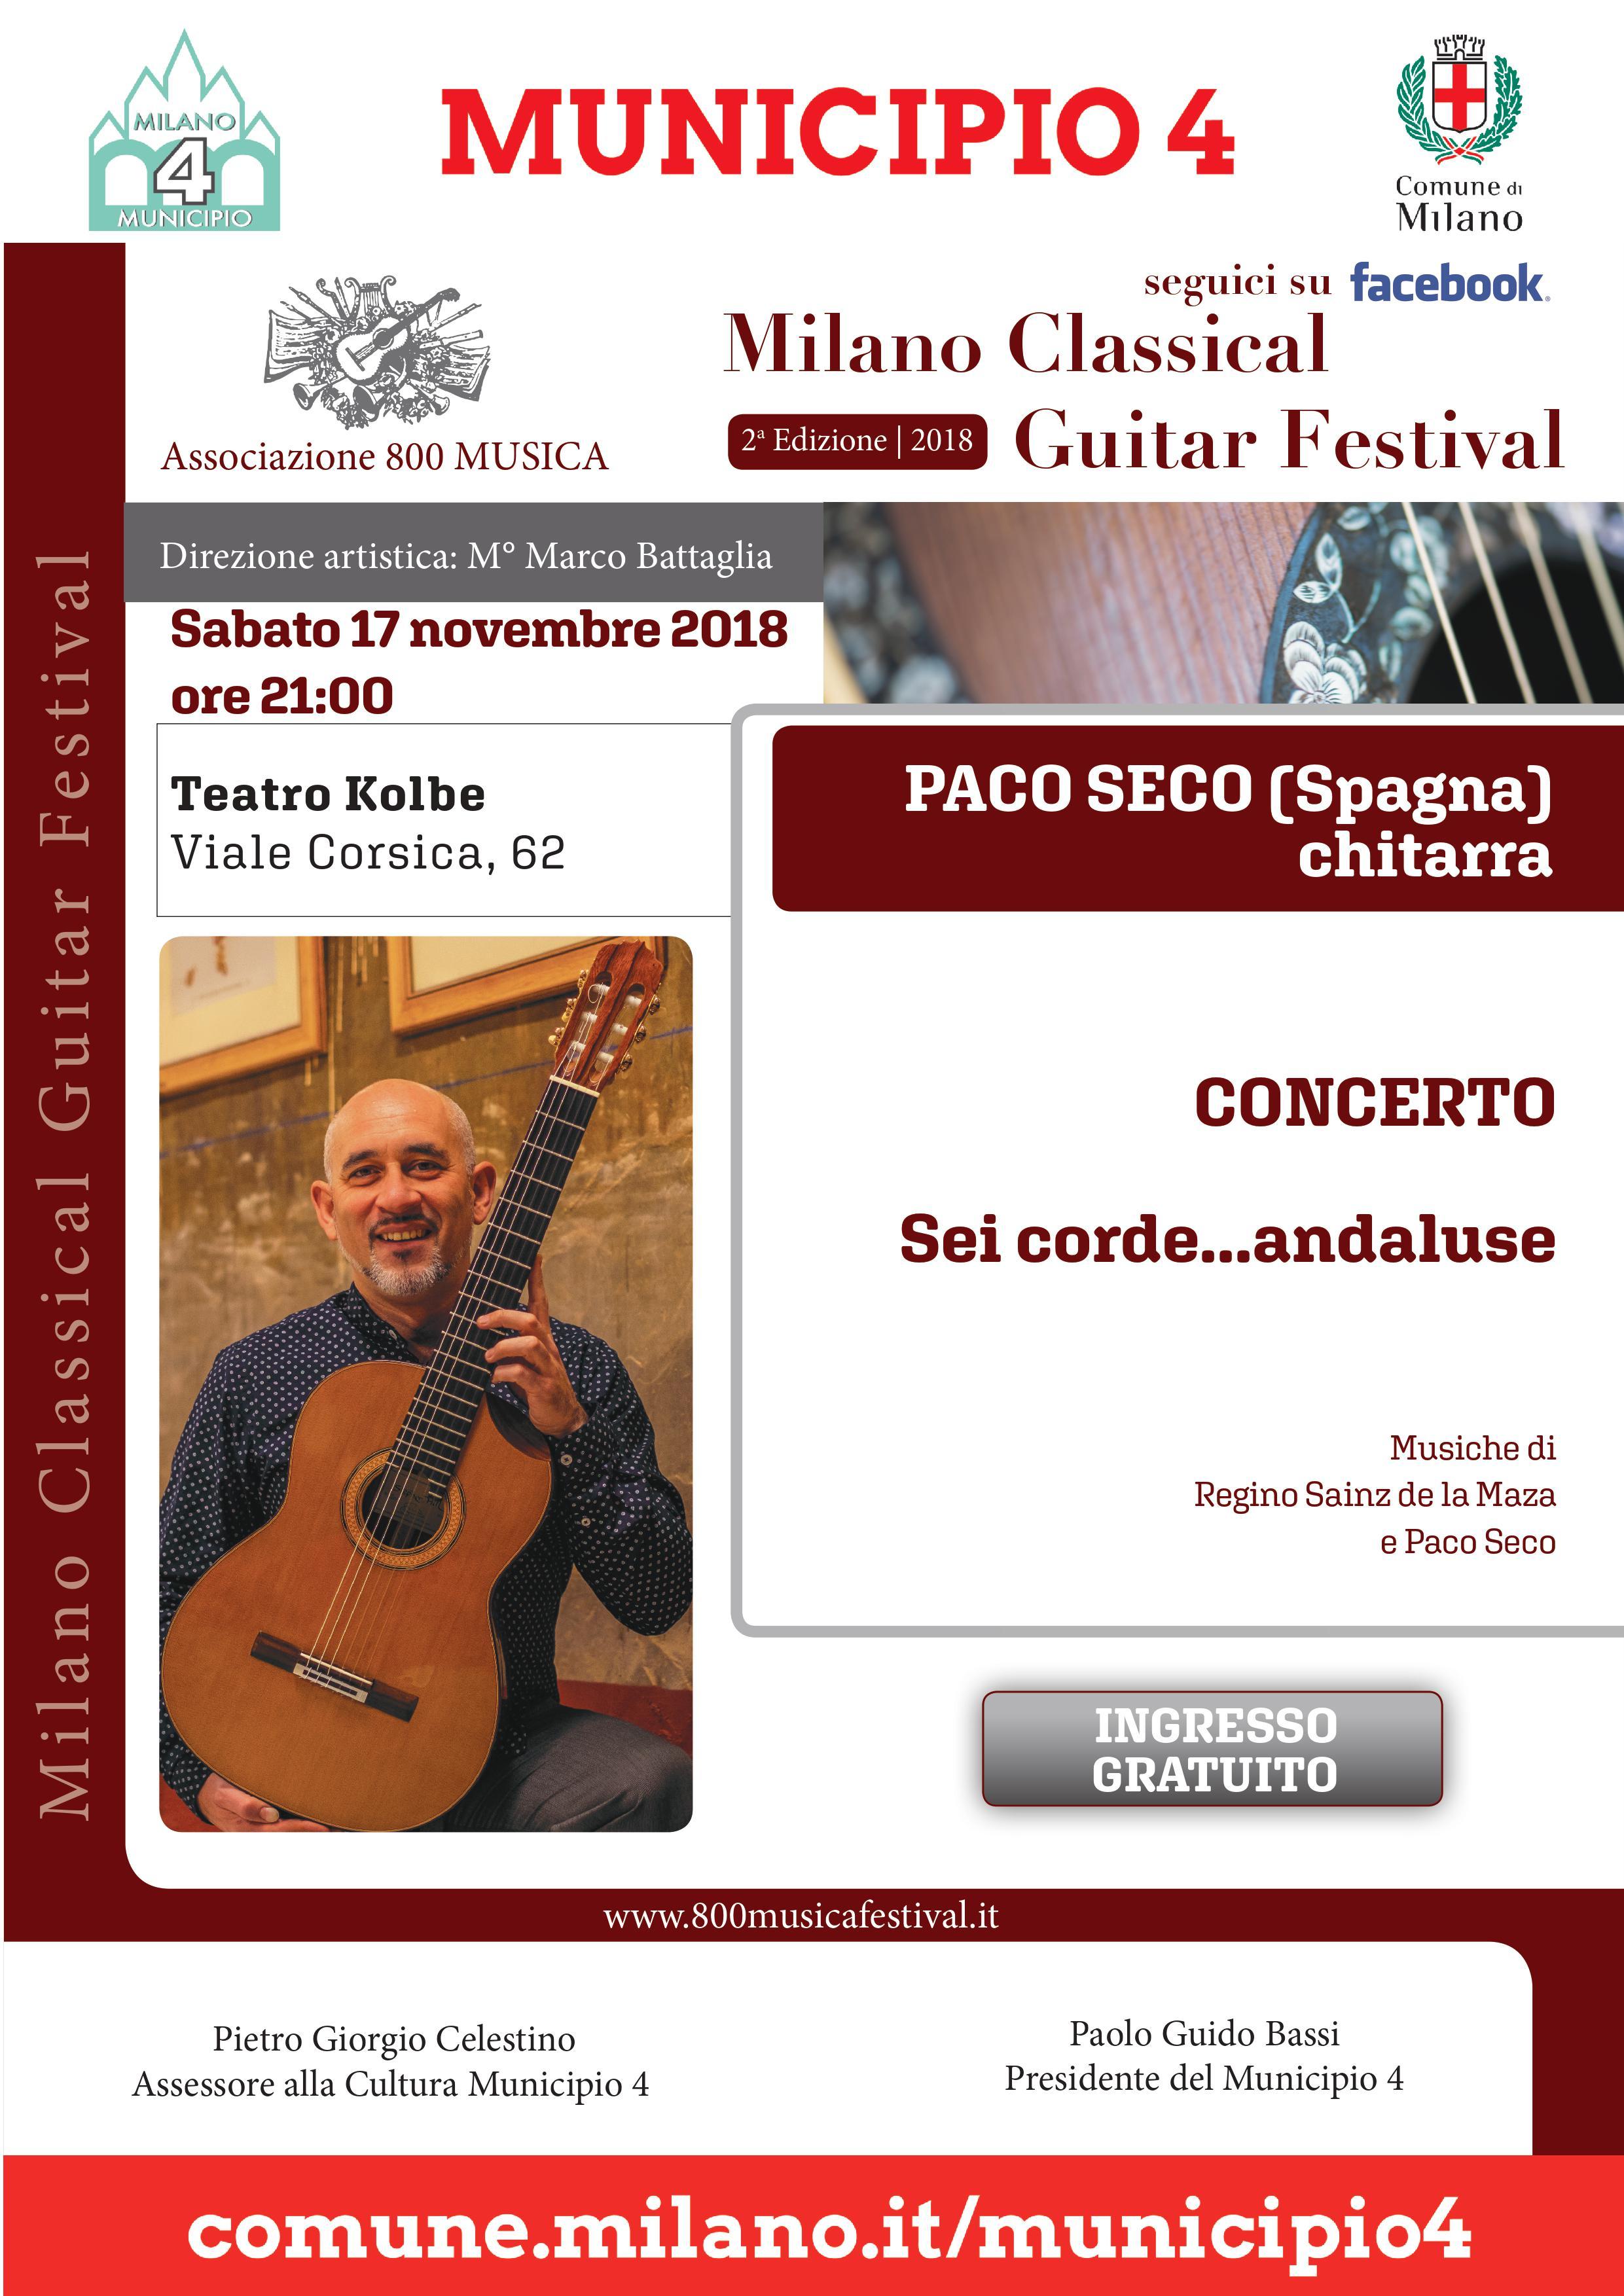 LOCANDINA CONCERTO PACO SECO 17-11-2018